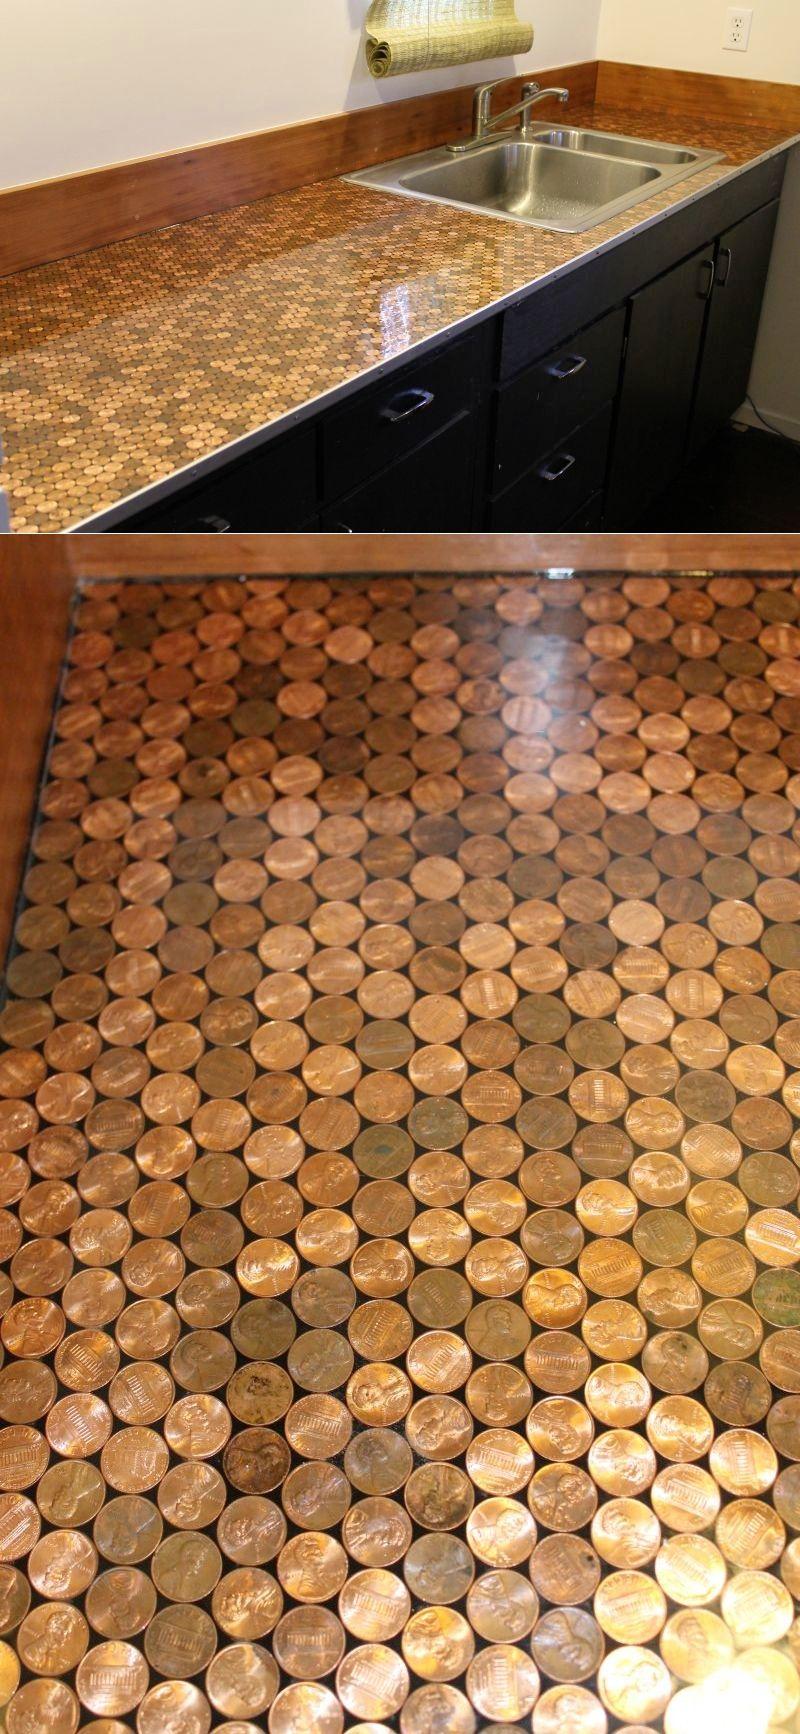 Kitchen Countertops Orange Penny Silver Sinks Black Cabinet Marble Floor 25 Unique For